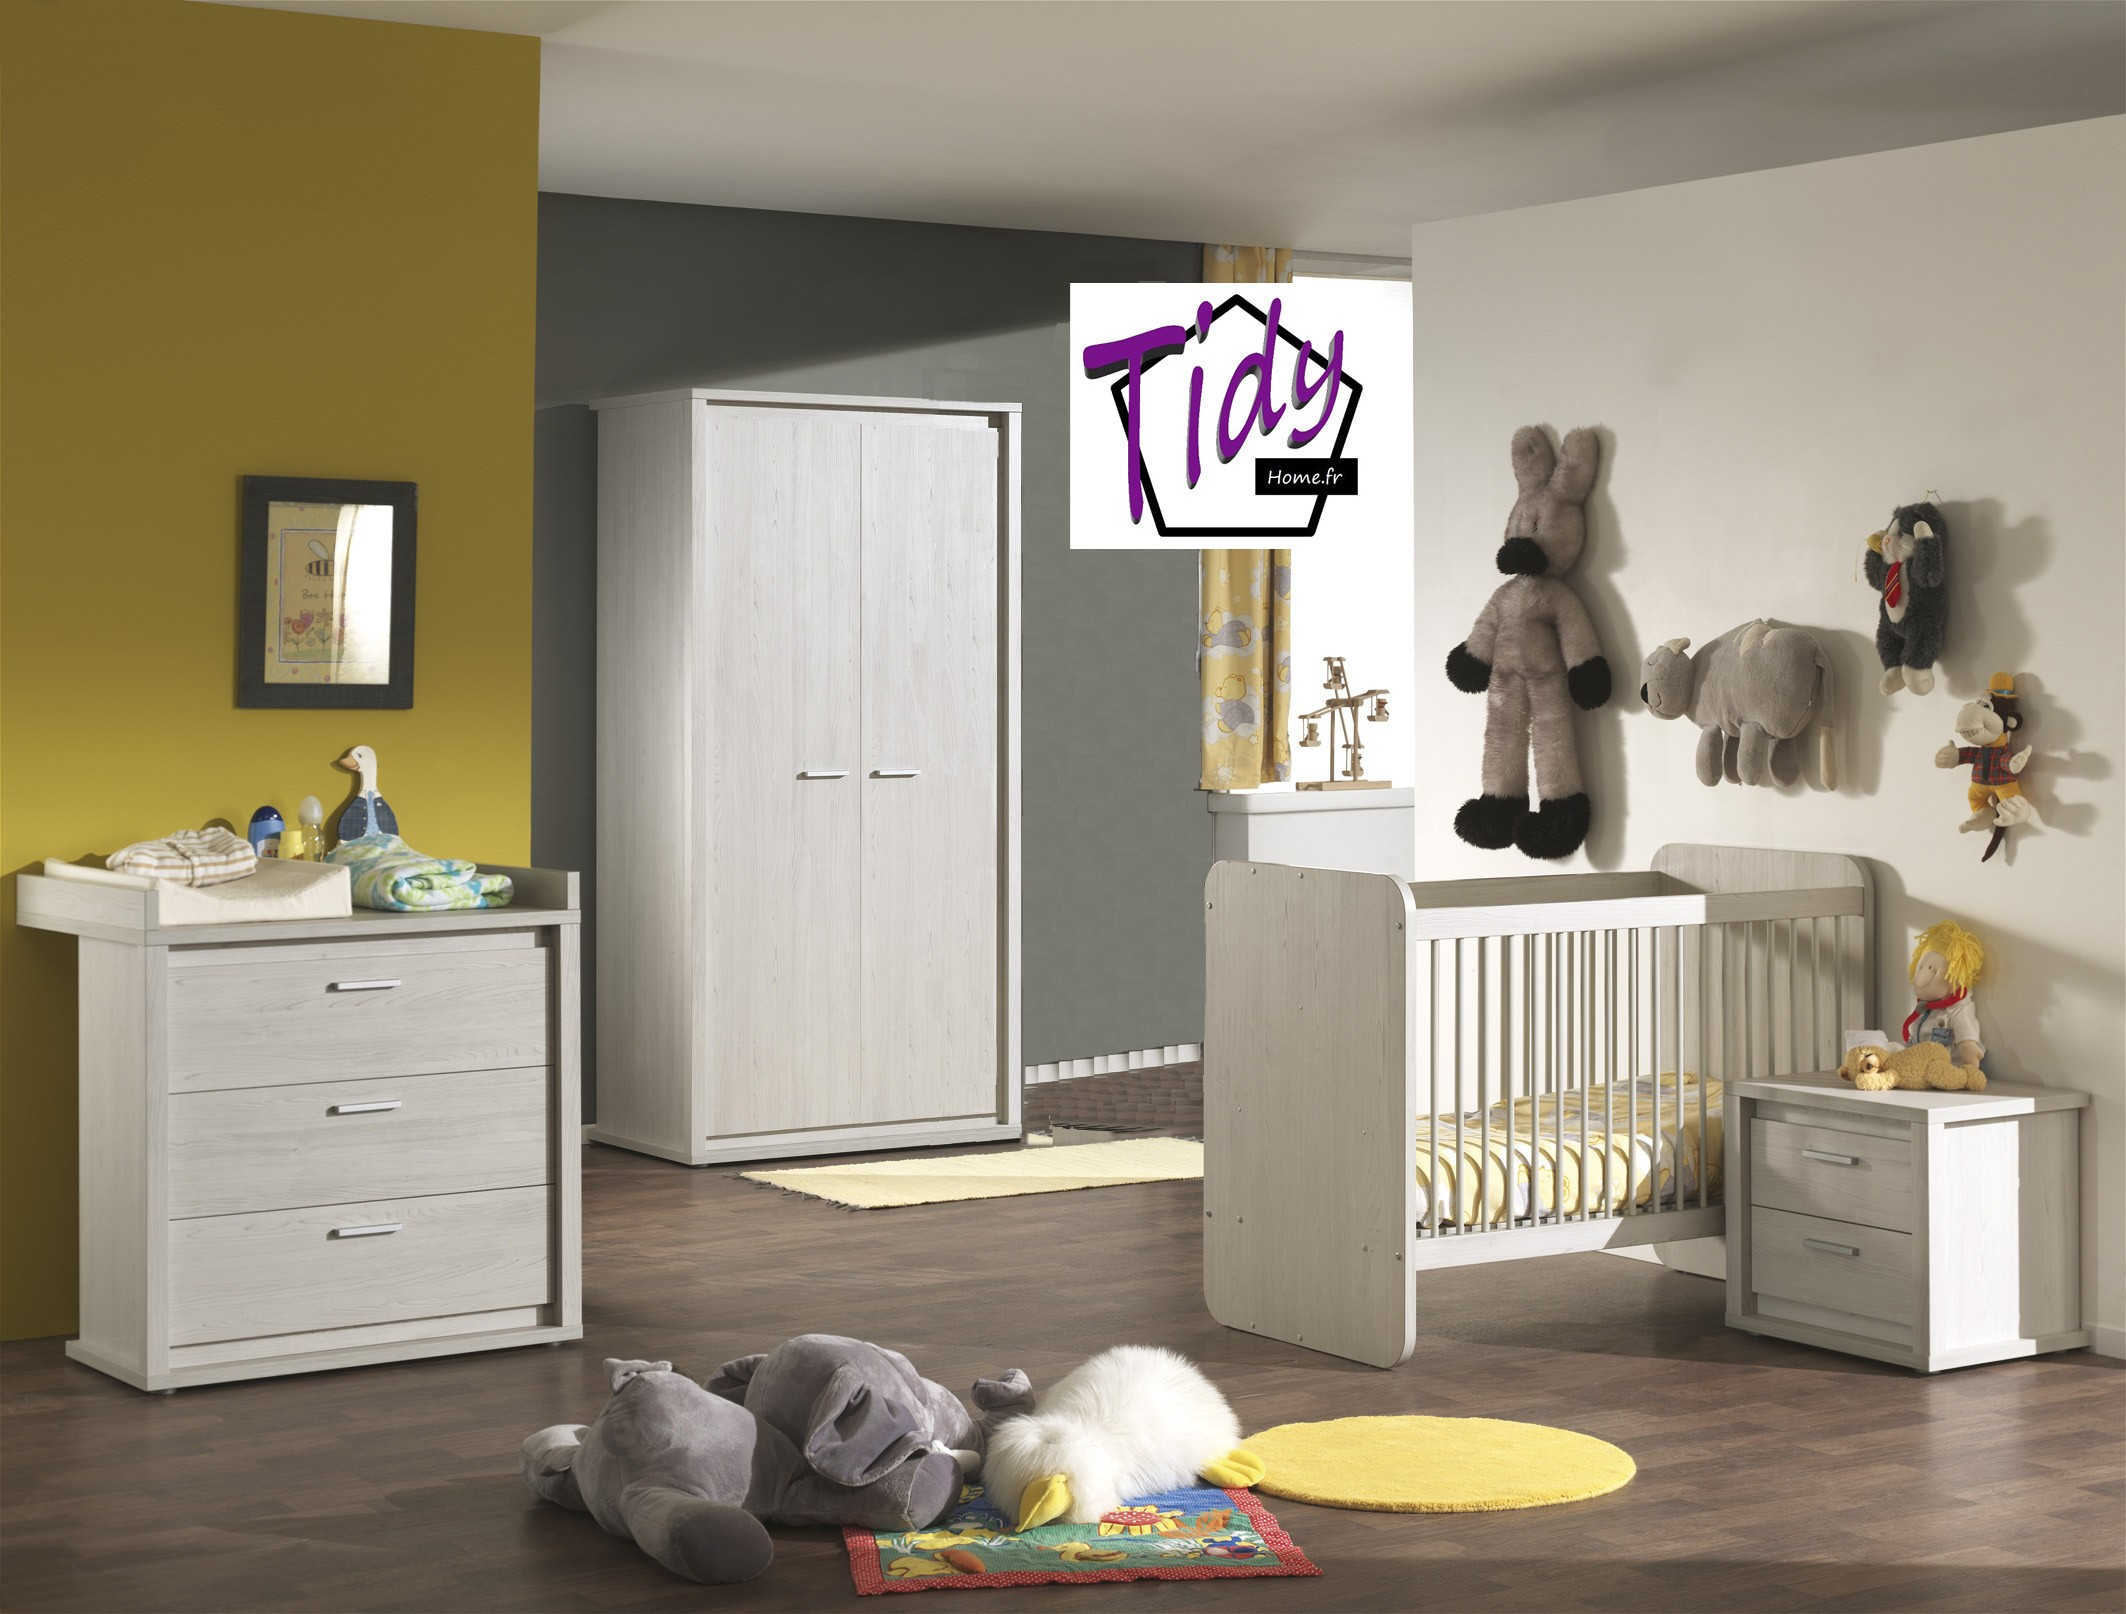 Chambre bébé Nina TIDY HOME